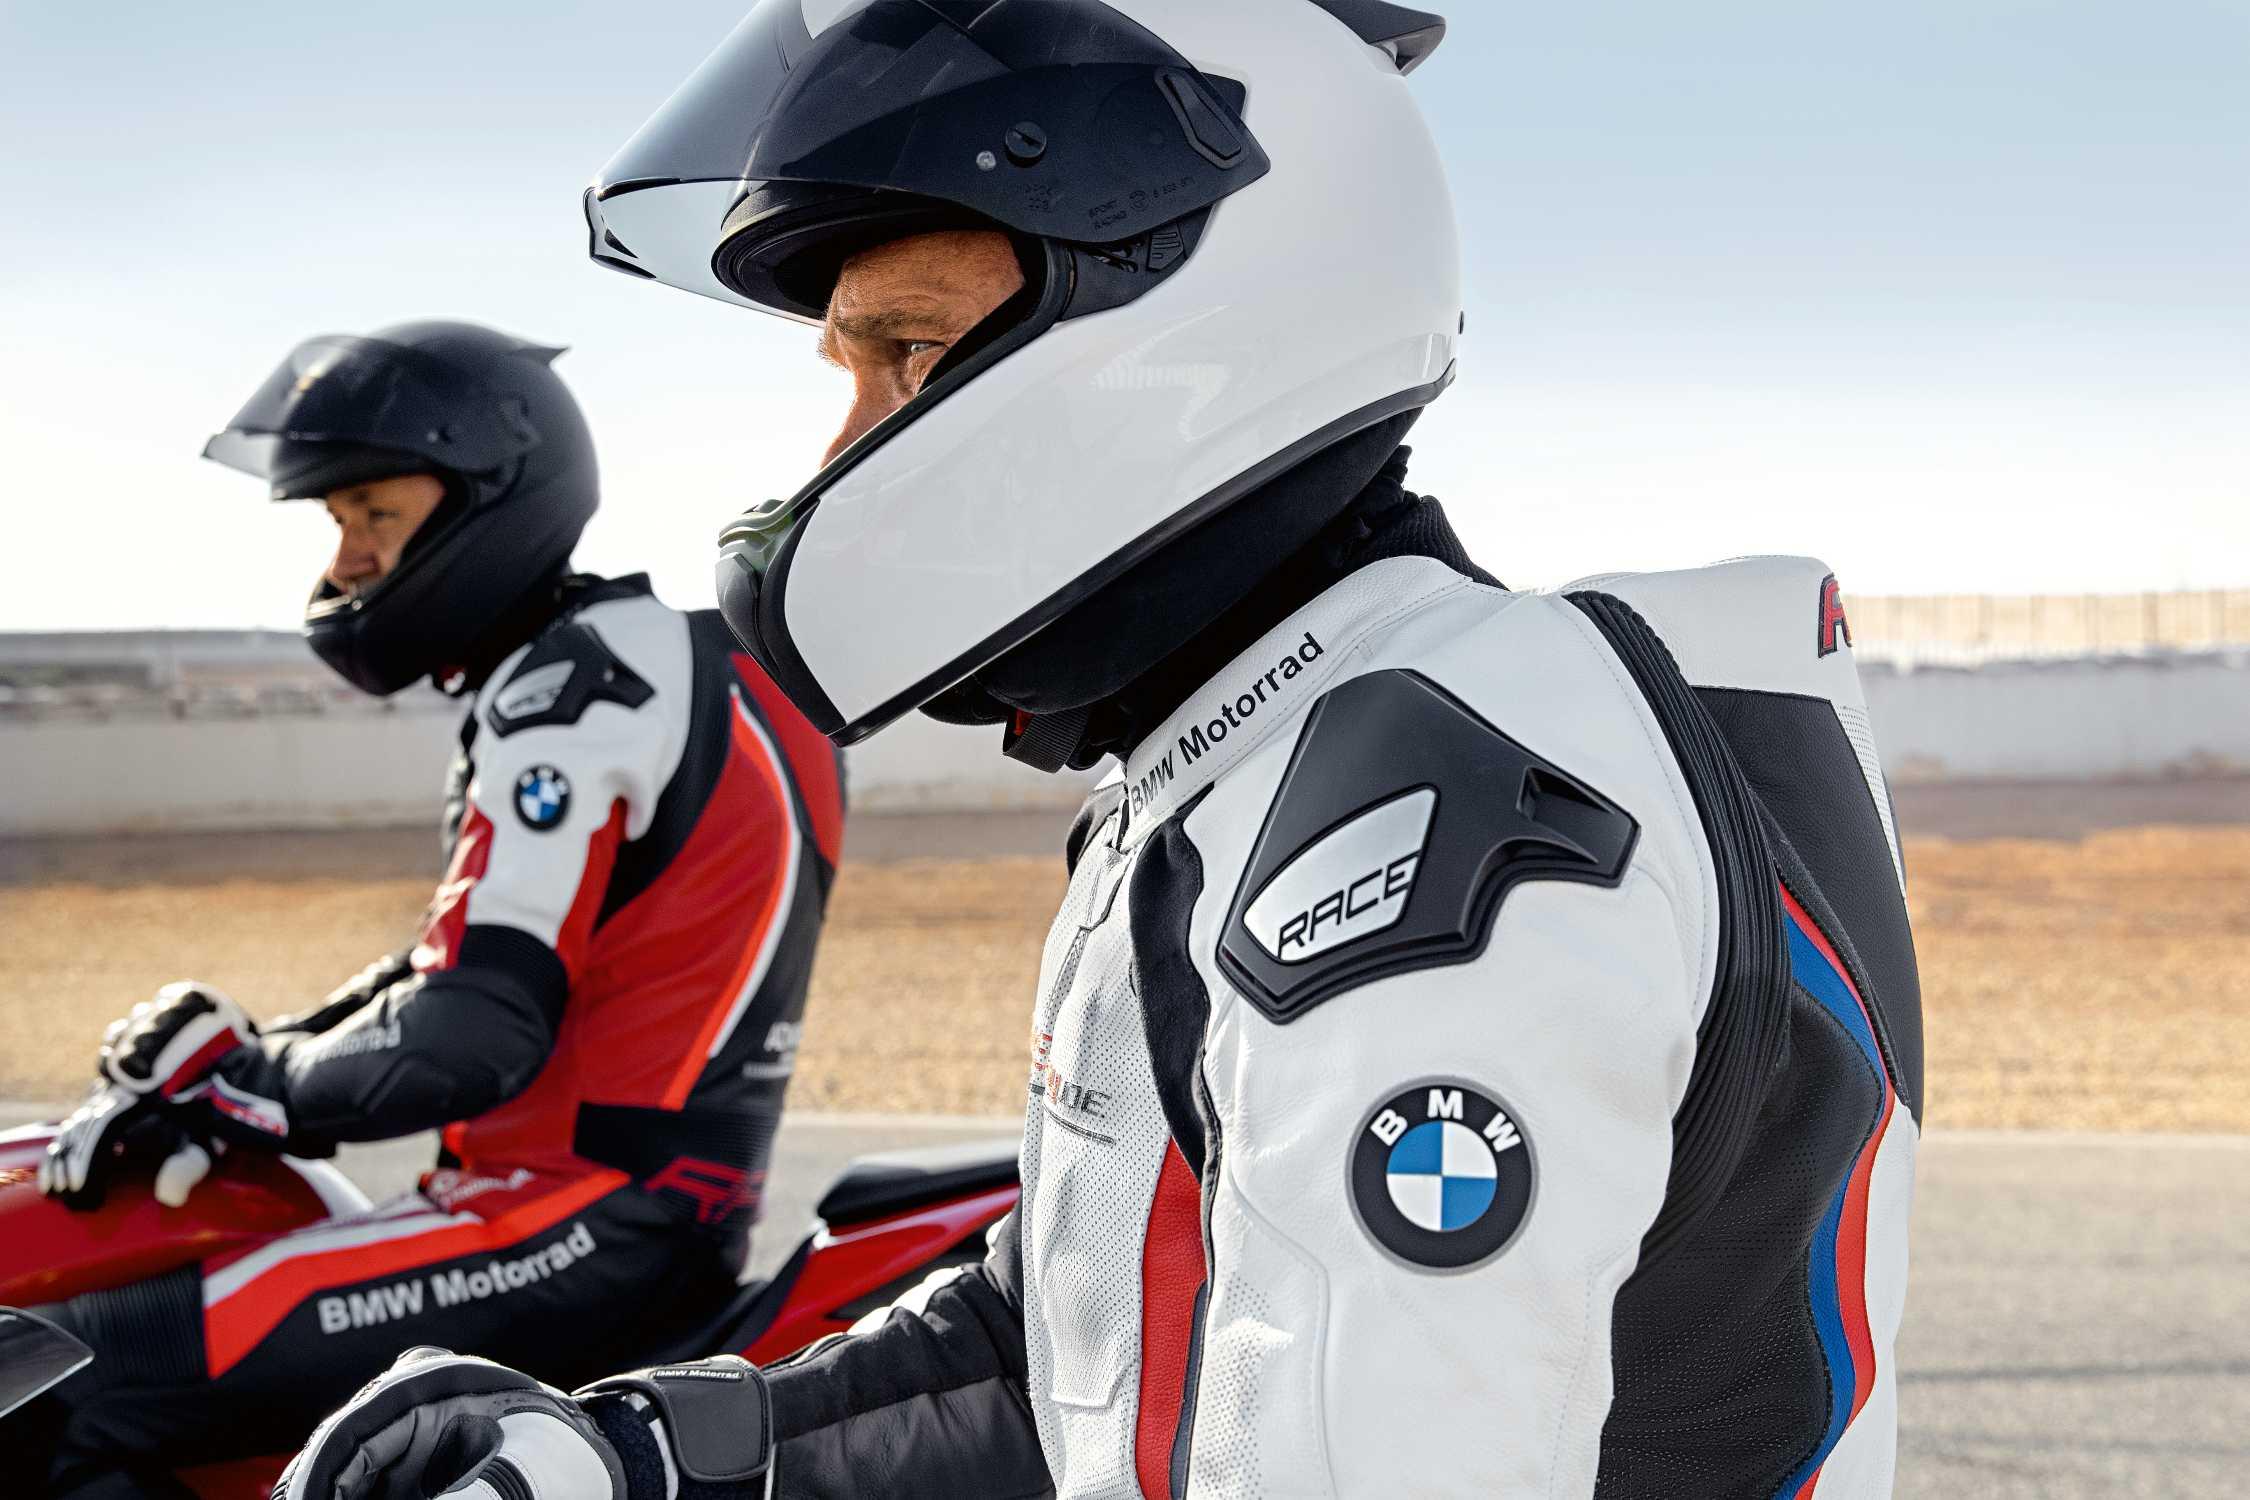 Bmw Motorrad Fahrerausstattung 2019